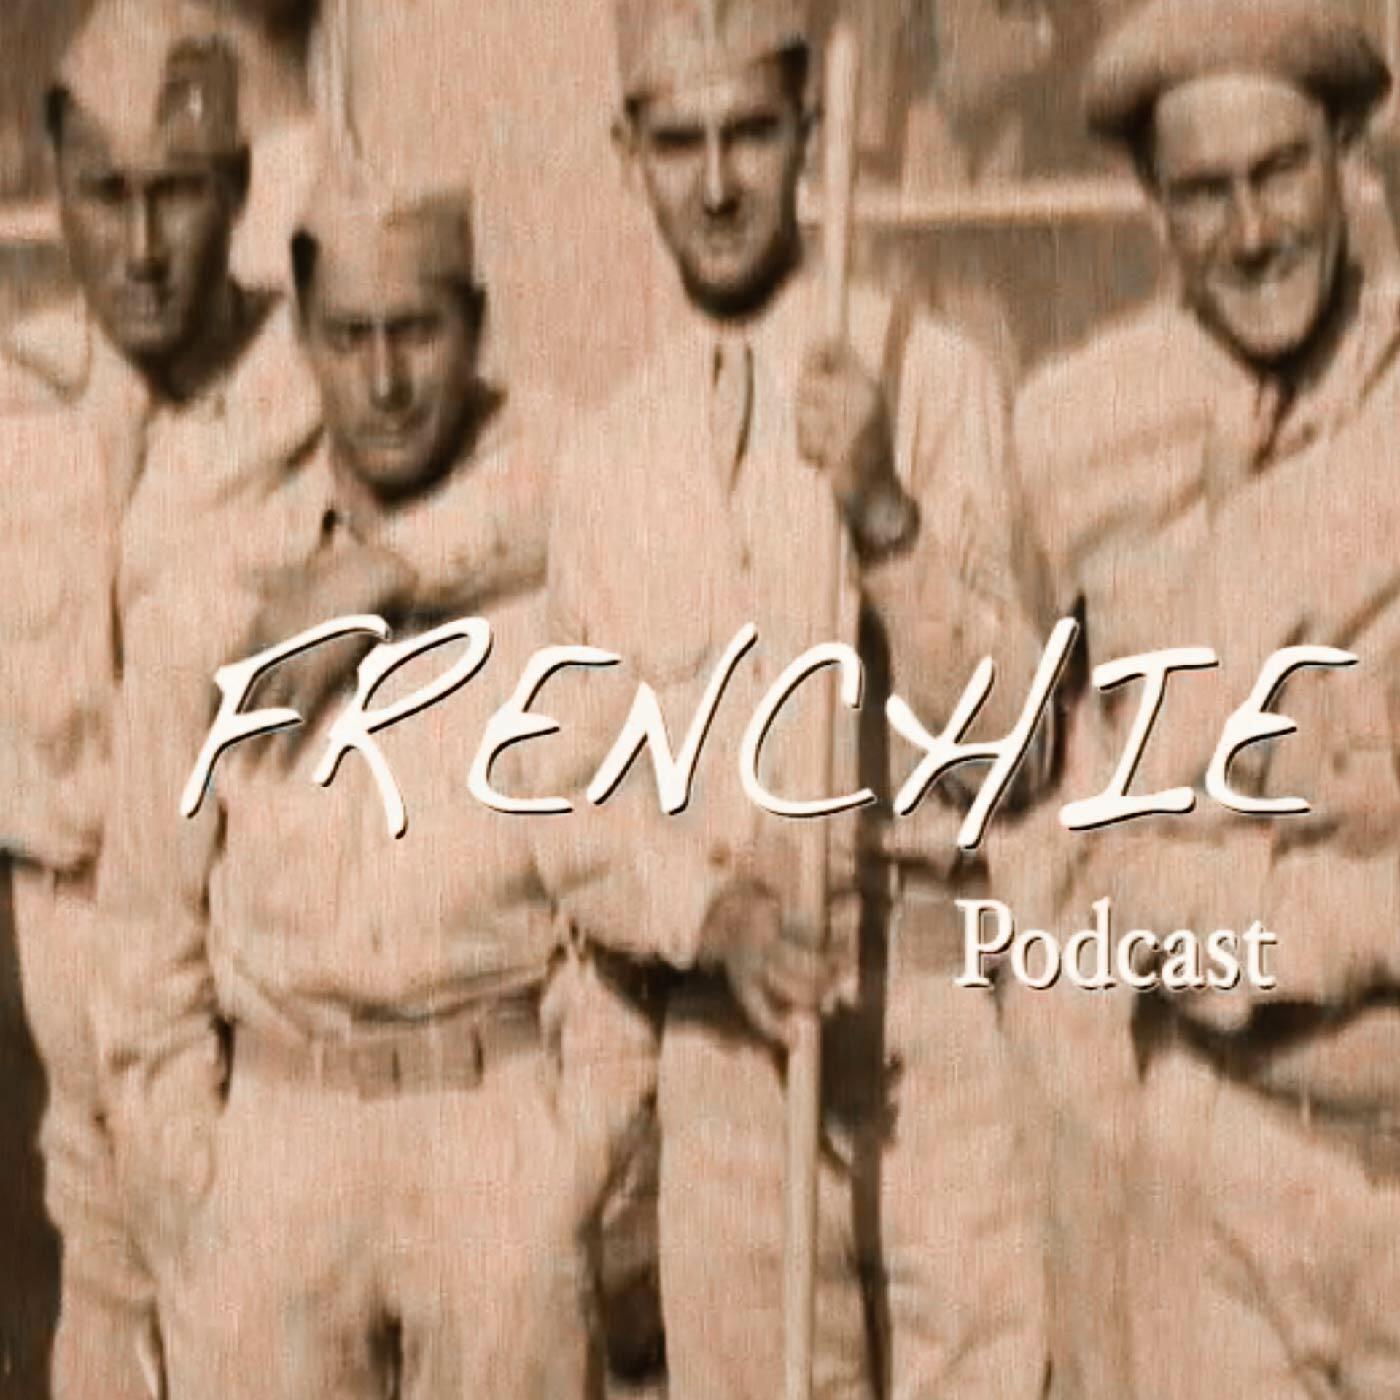 Frenchie Podcast